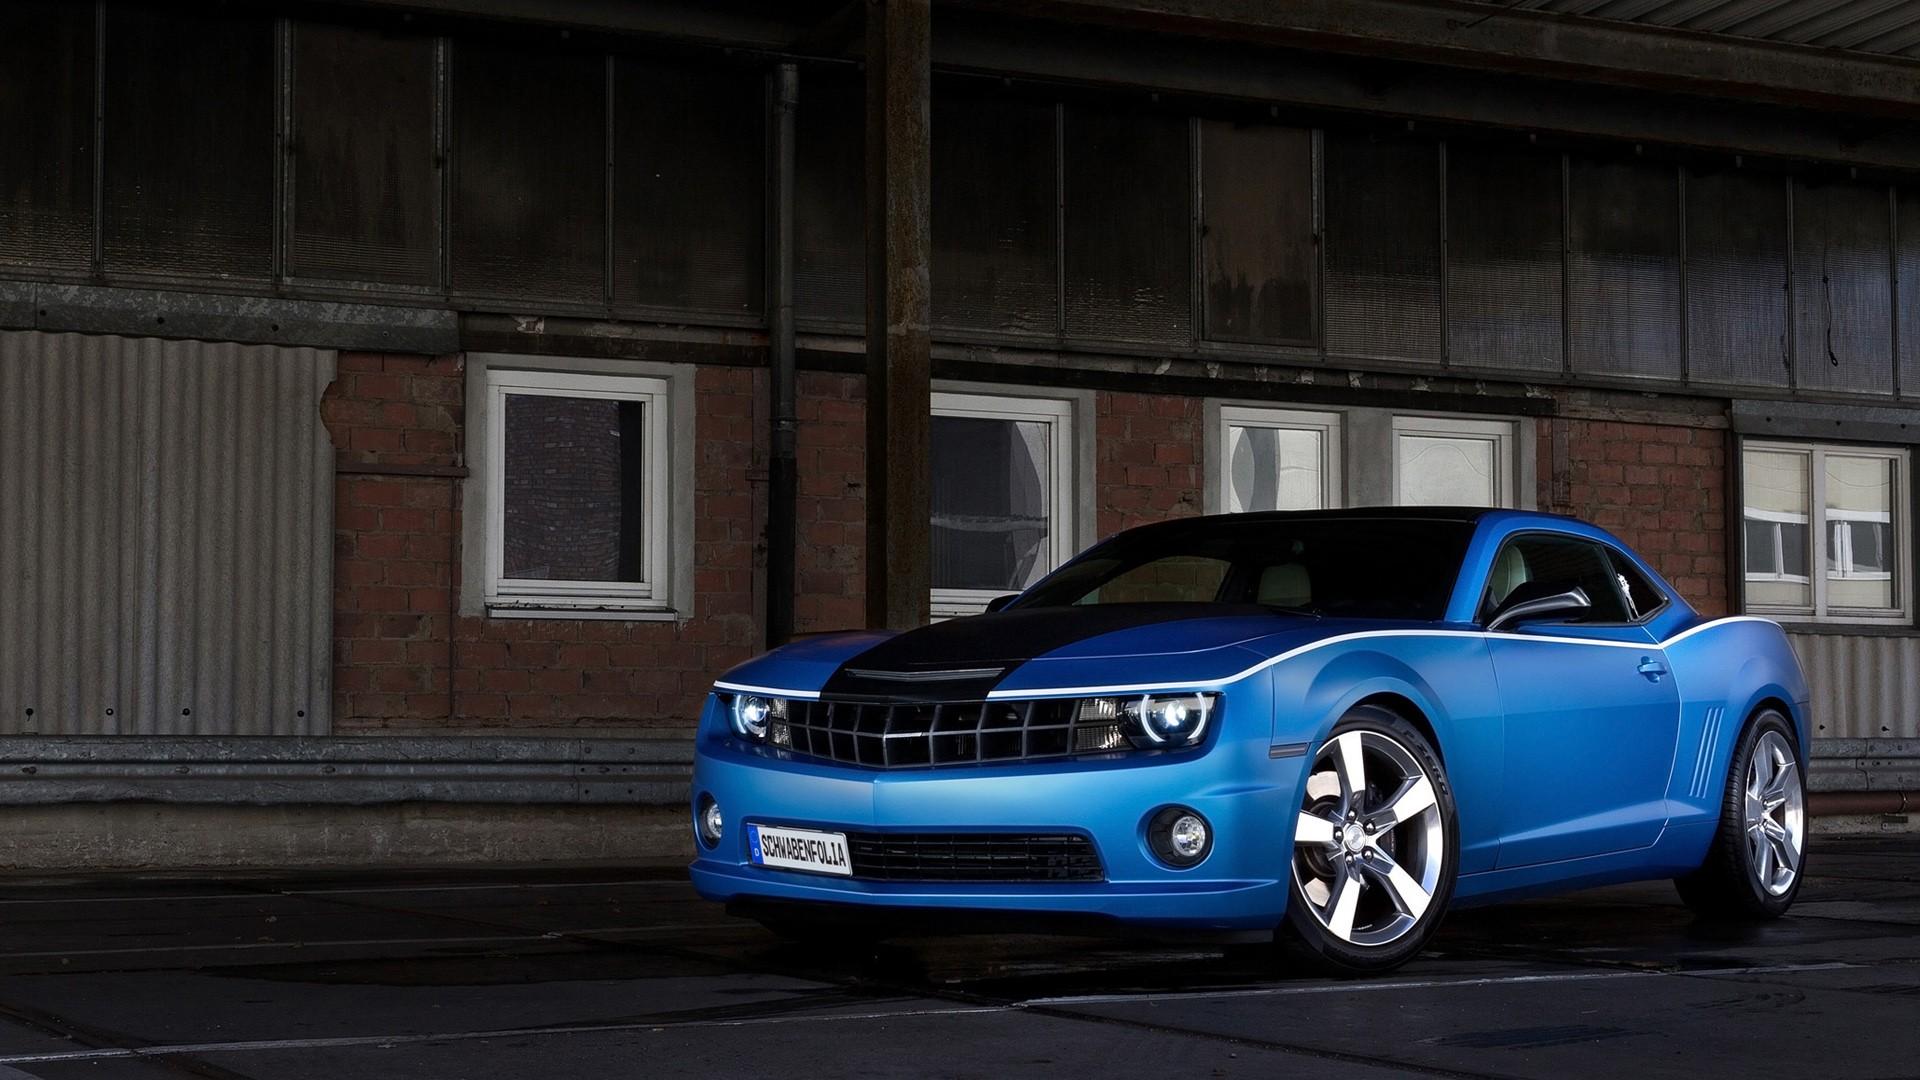 Hummer Car Images For Wallpaper Schwabenfolia Chevrolet Camaro Ss 2013 Wallpaper Hd Car